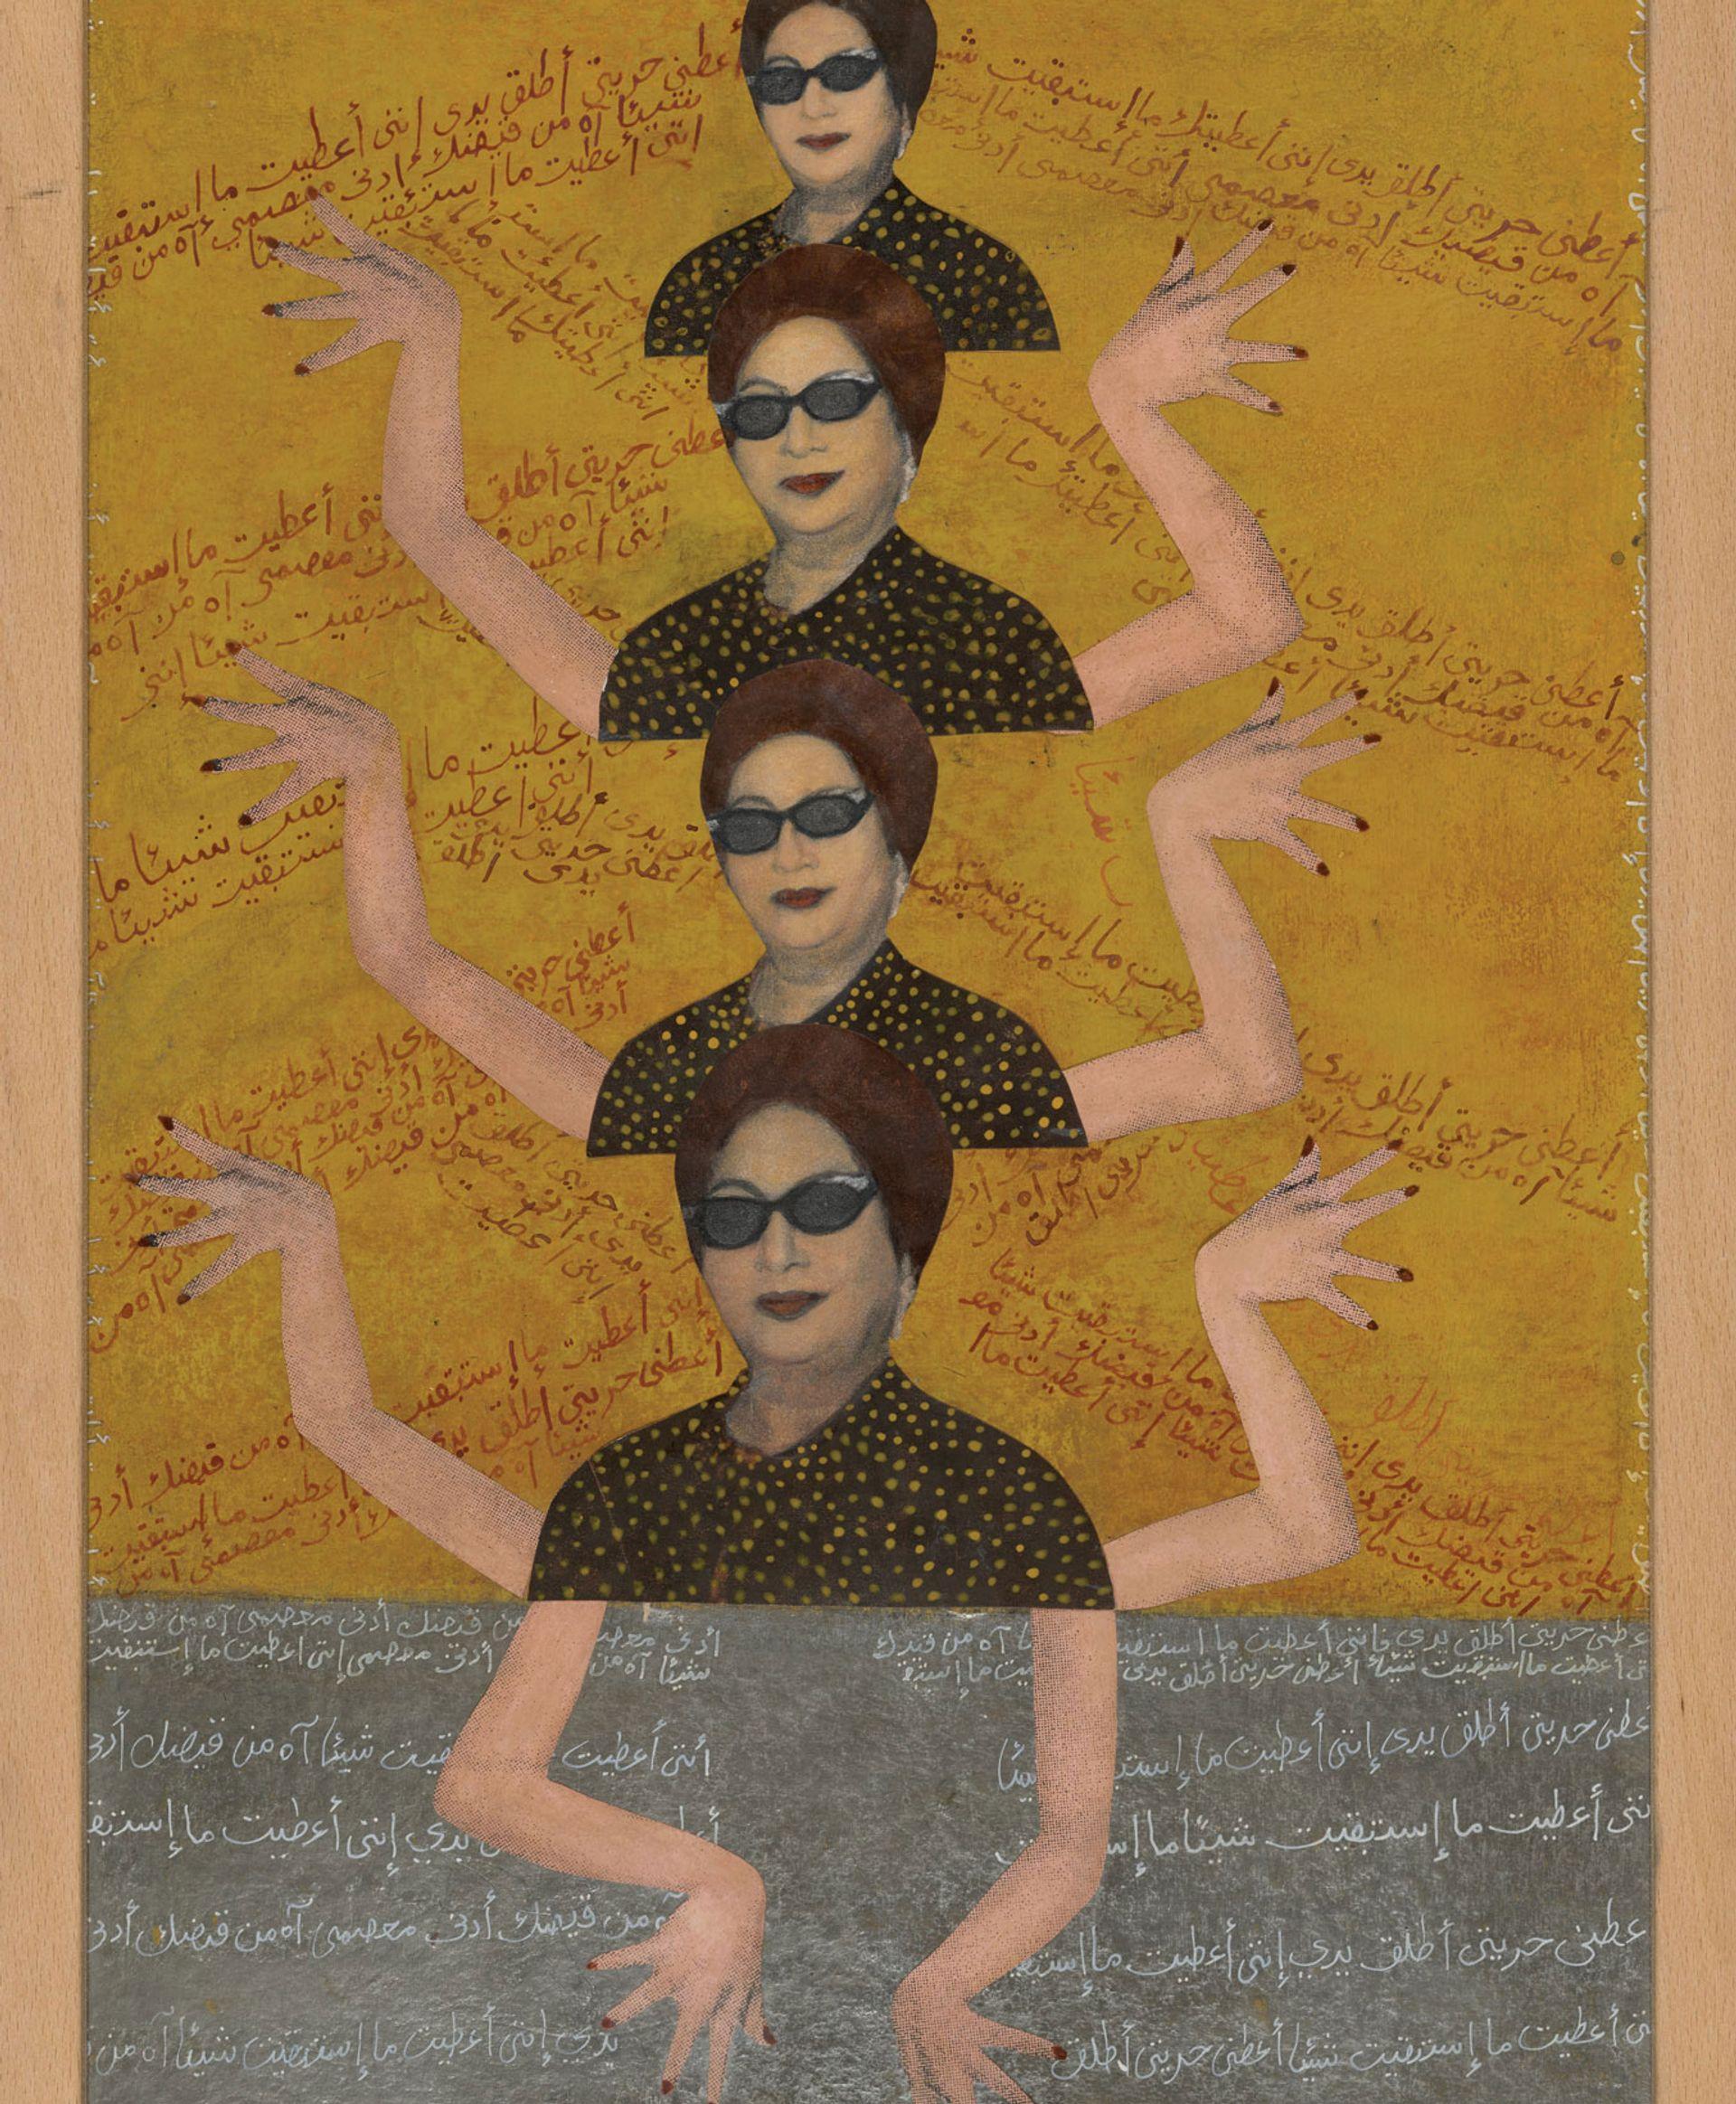 Huda Lutfi's Al-Sitt and her Sunglasses (2008) Courtesy of the British Museum